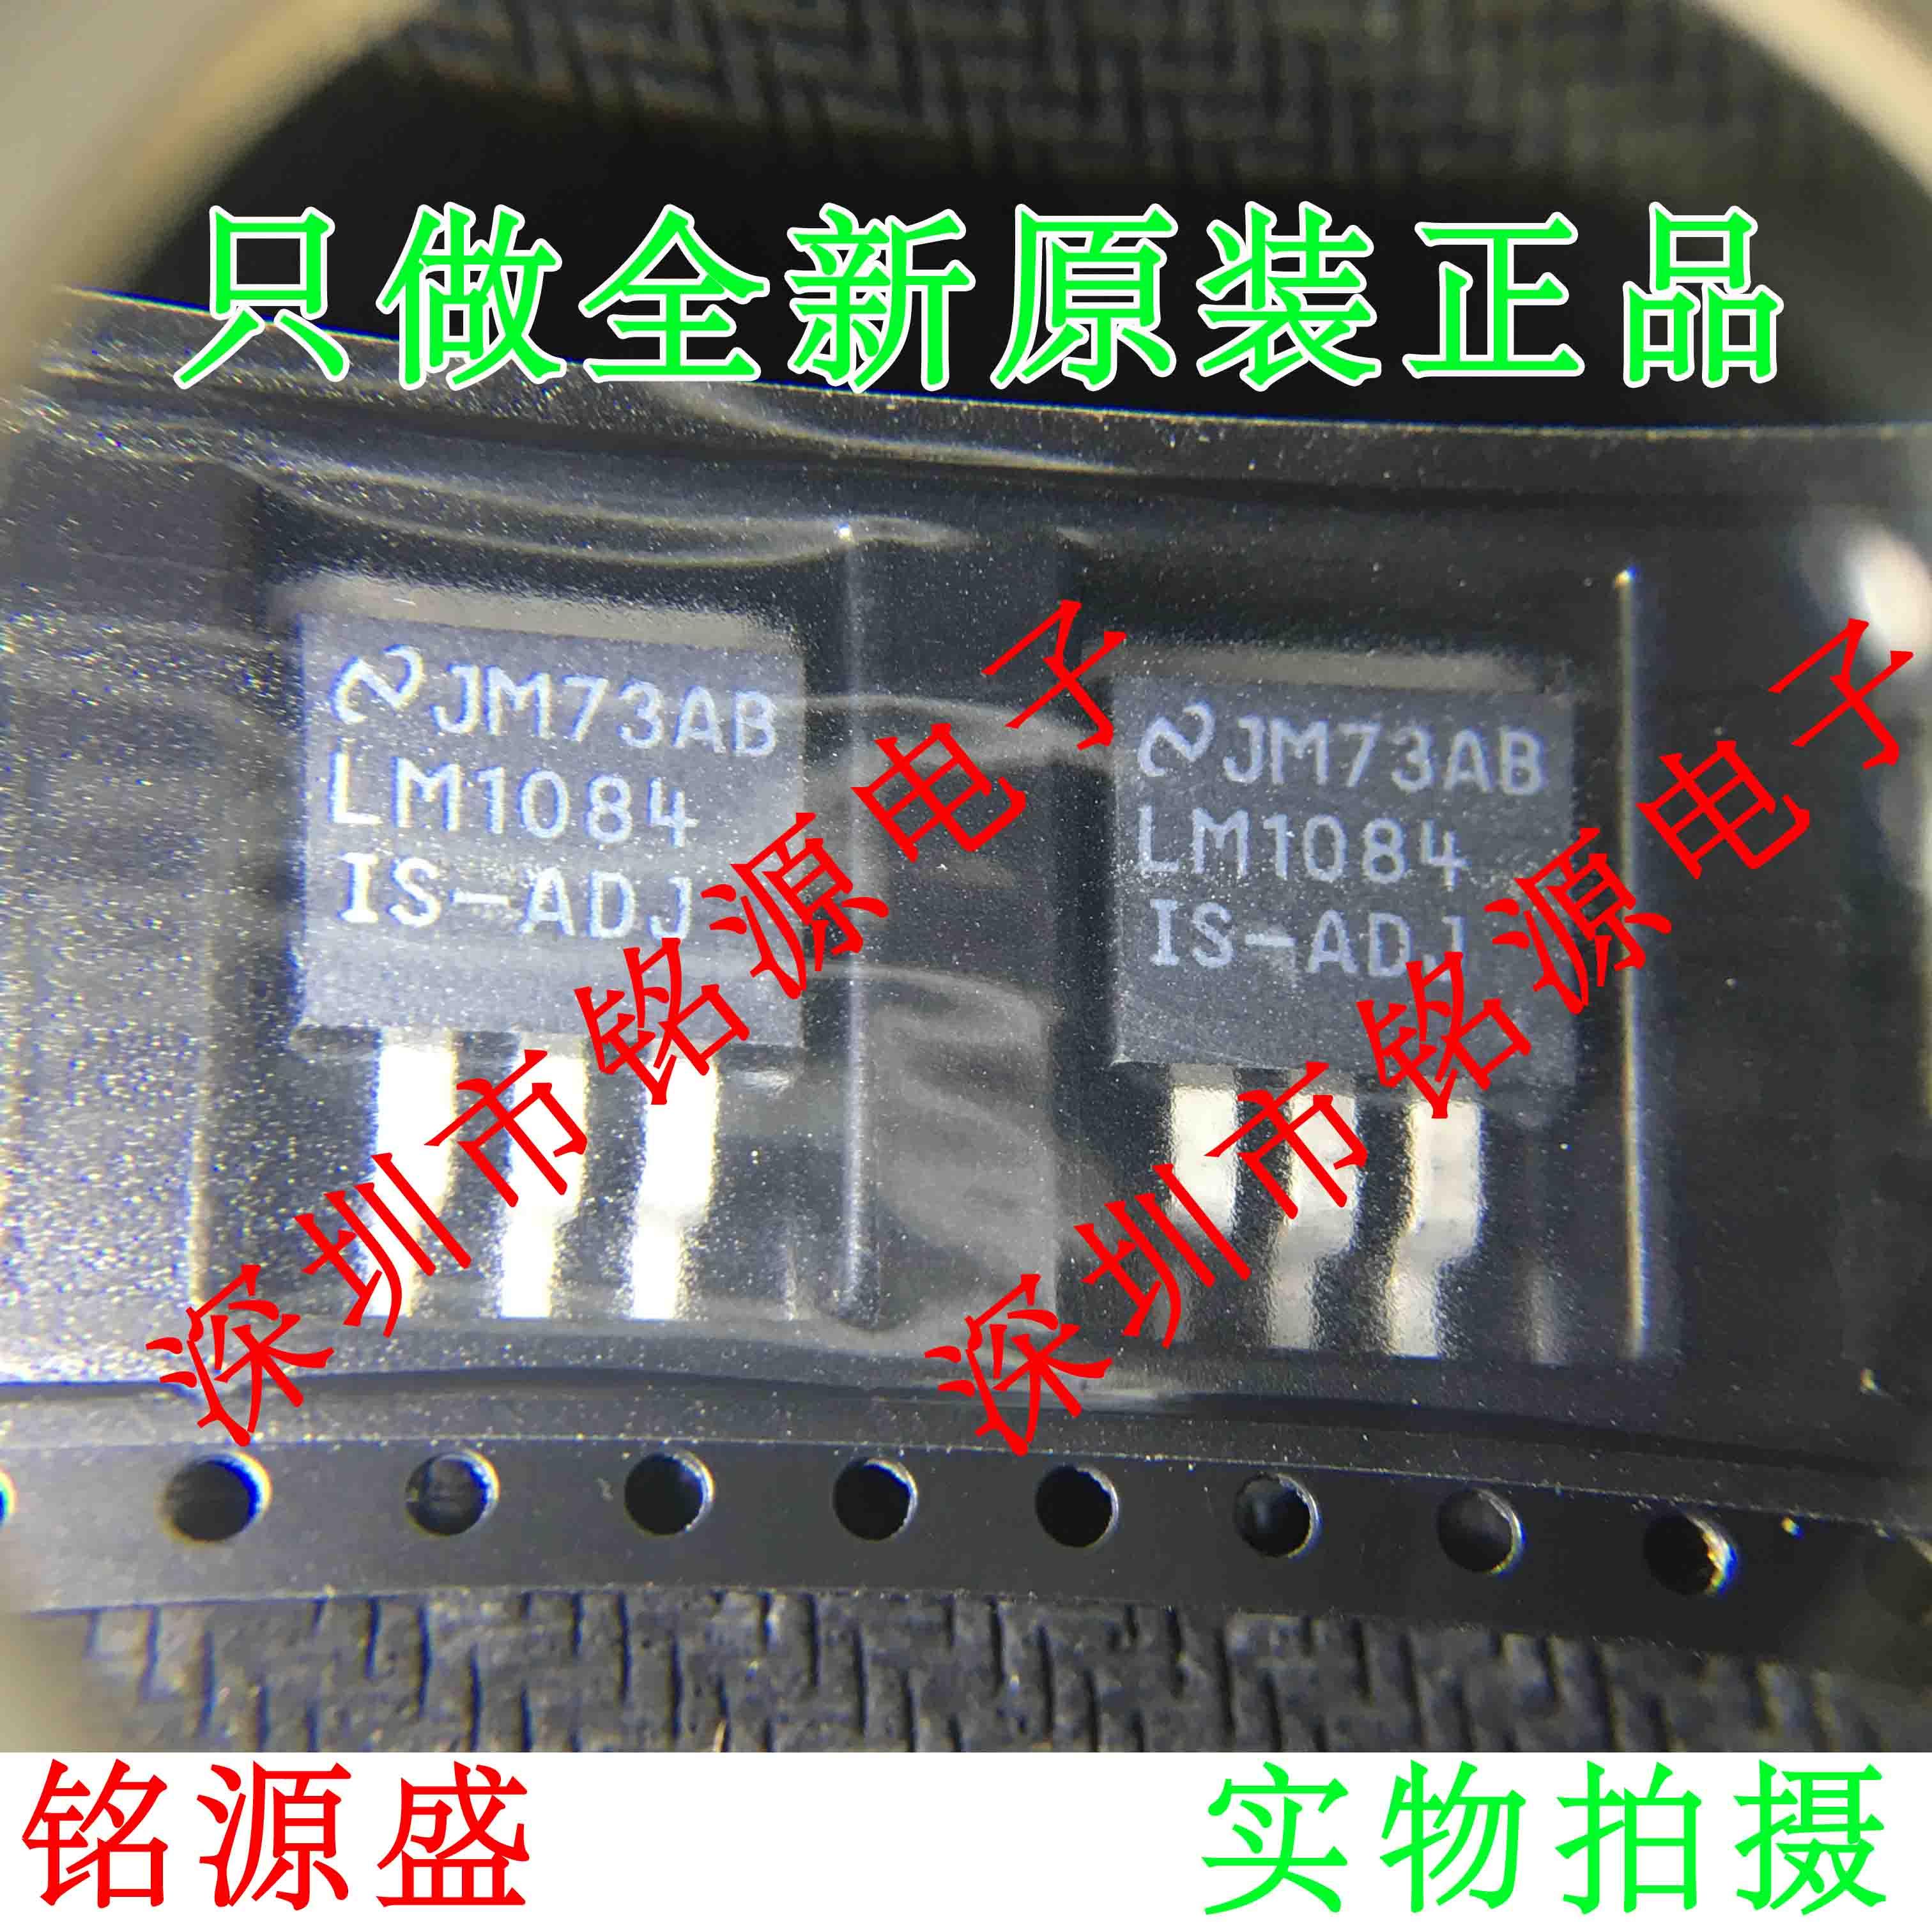 Envío Gratis LM1084ISX-ADJ LM1084IS-ADJ LM1084 a-263